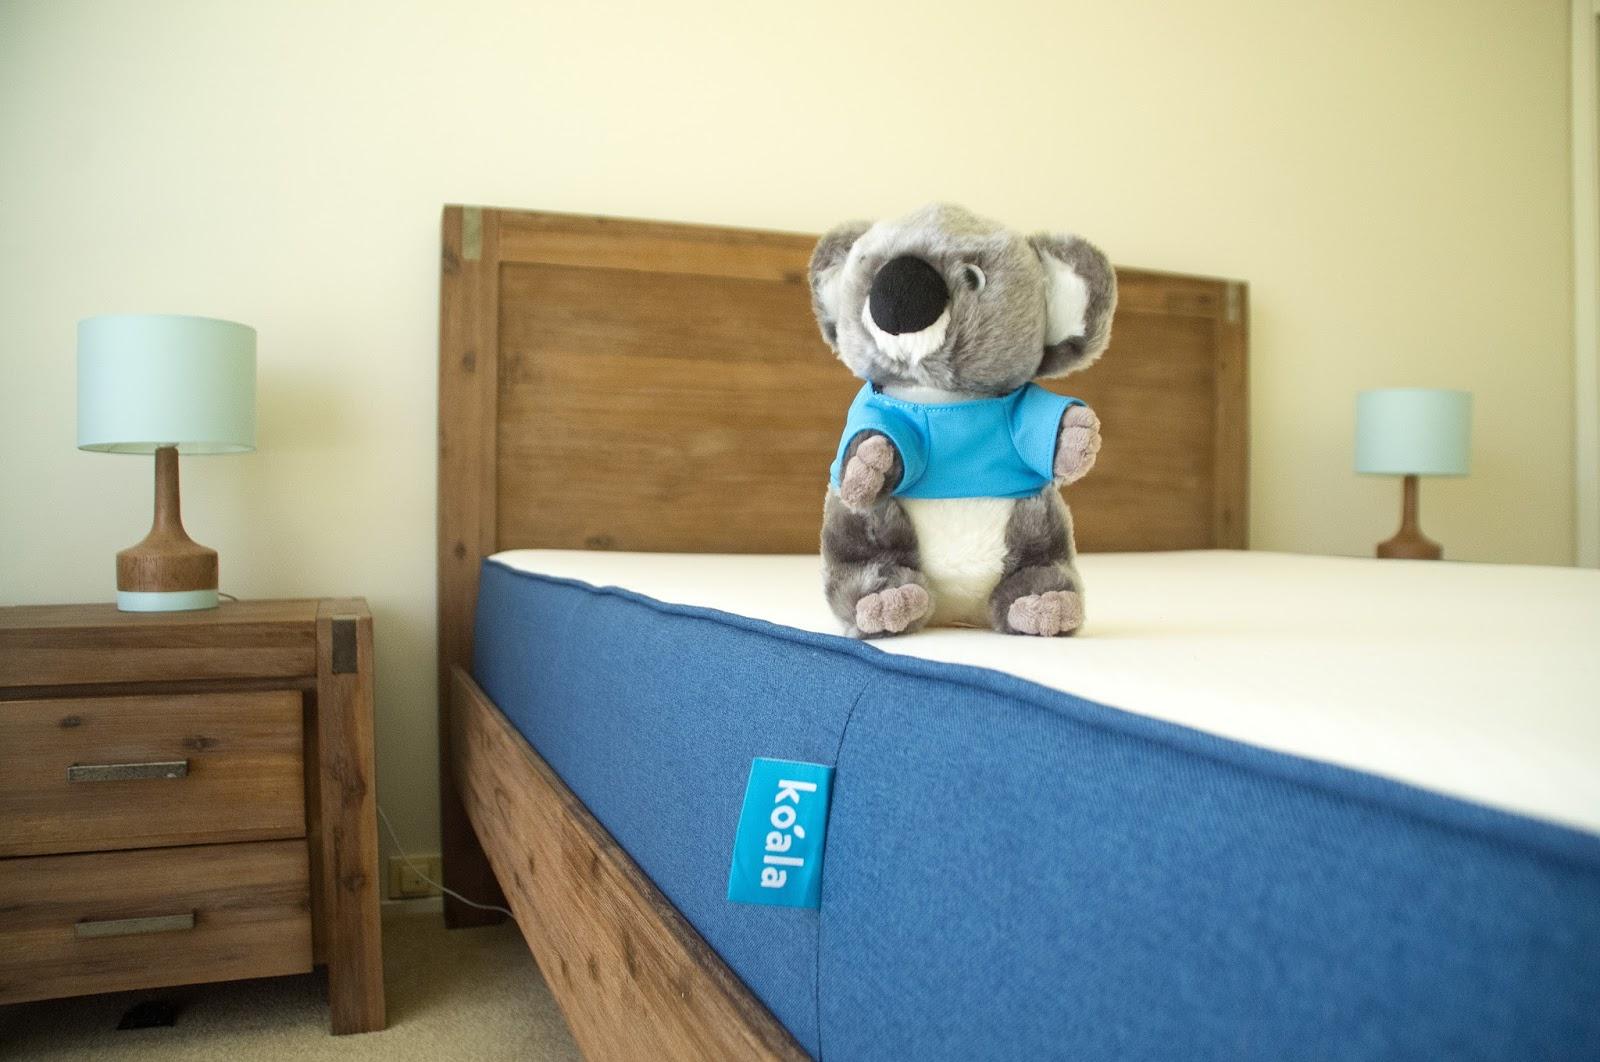 Koala Mattress-In-a-Box: The Perfect Australian Mattress